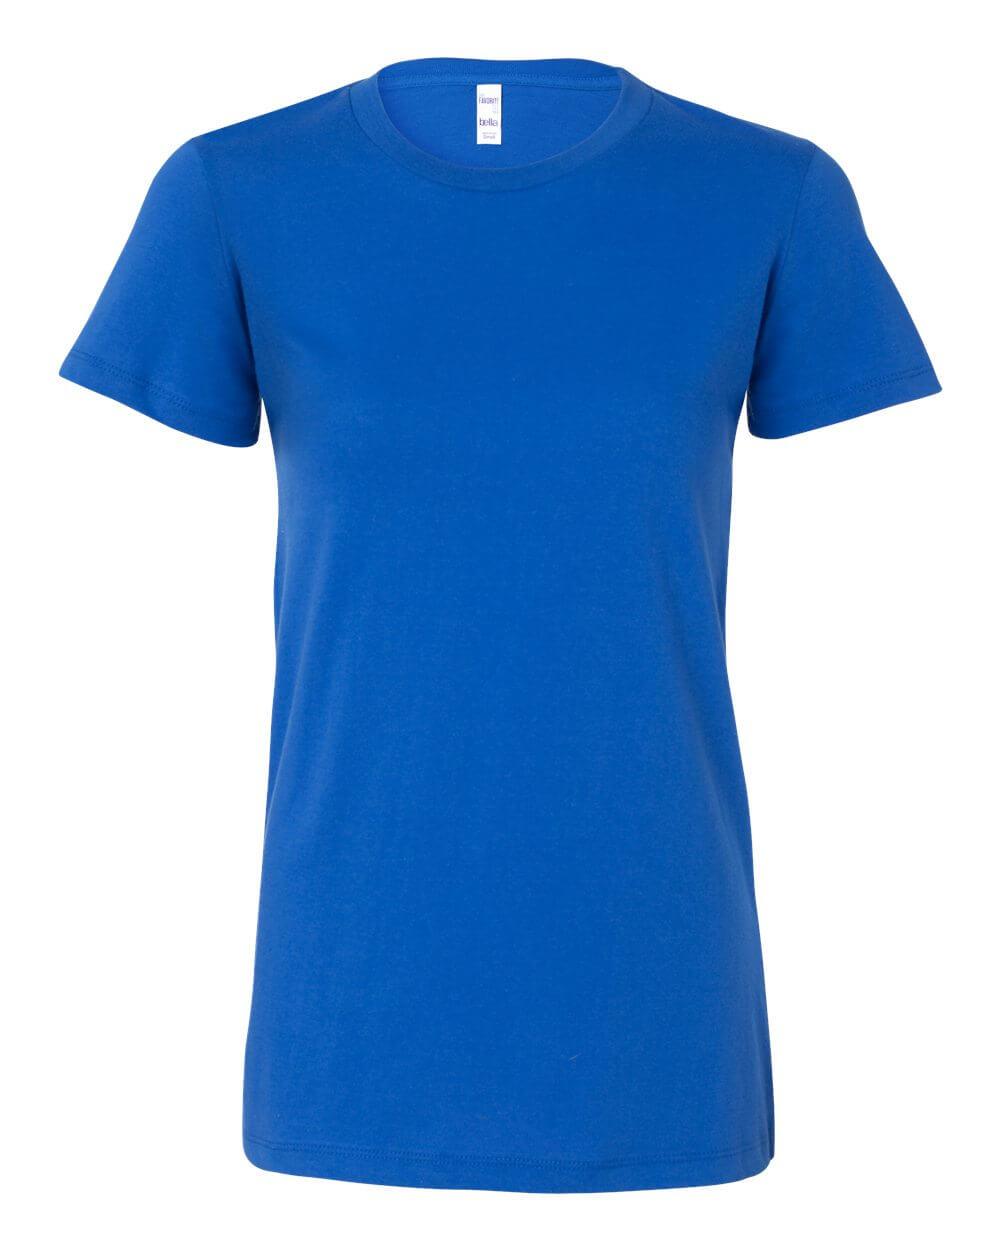 Bella__Canvas_6004_True_Royal Blue Custom T Shirts